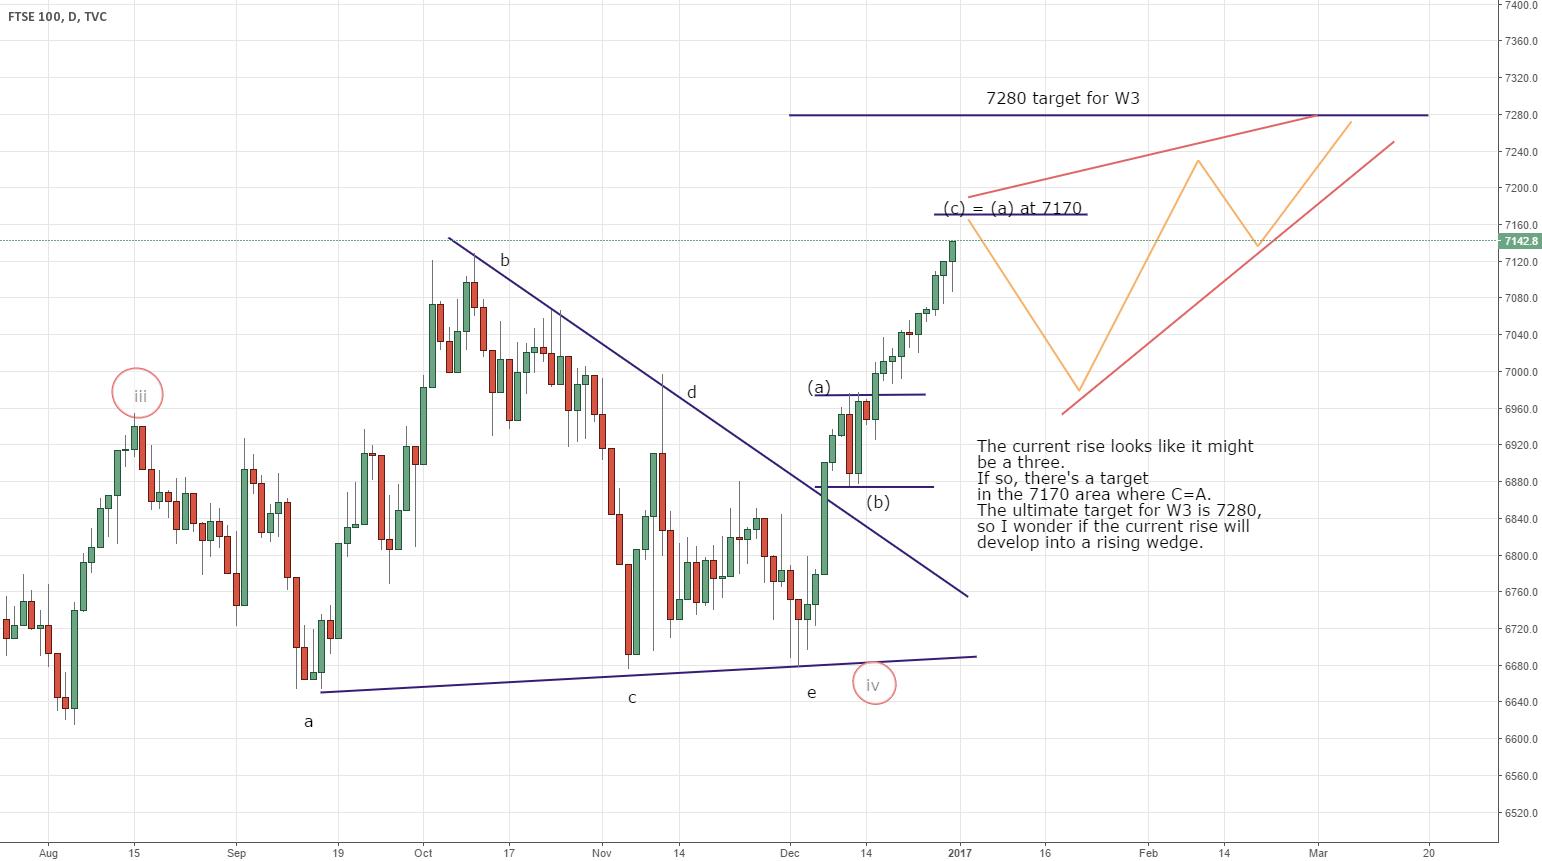 FTSE rising wedge developing?